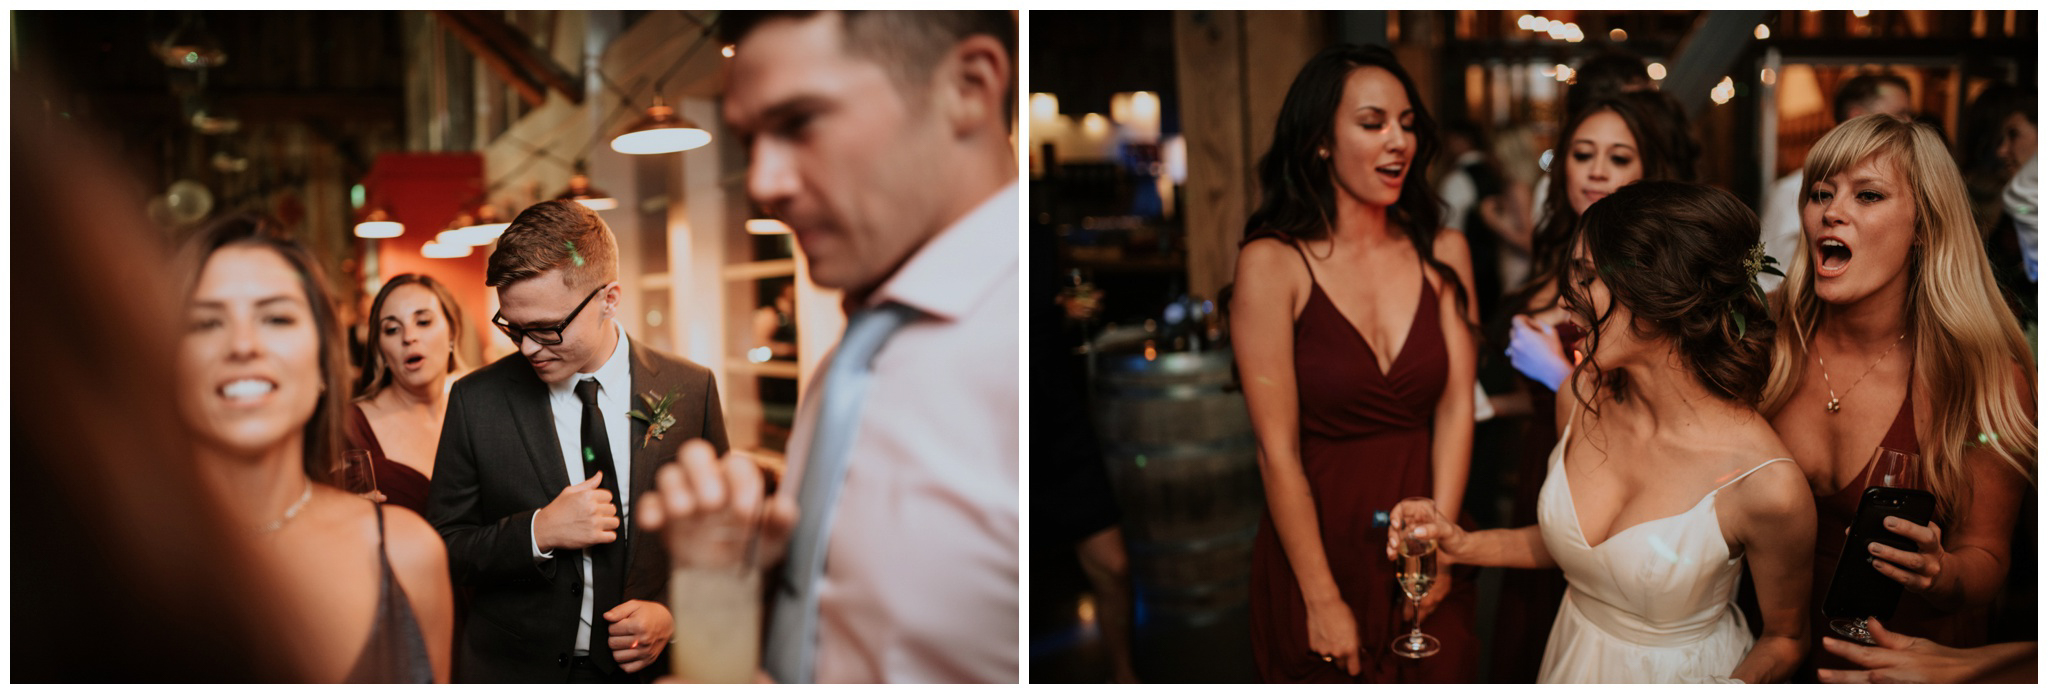 alyssa-keiran-westland-distillery-urban-seattle-wedding-photographer-caitlyn-nikula-168.jpg